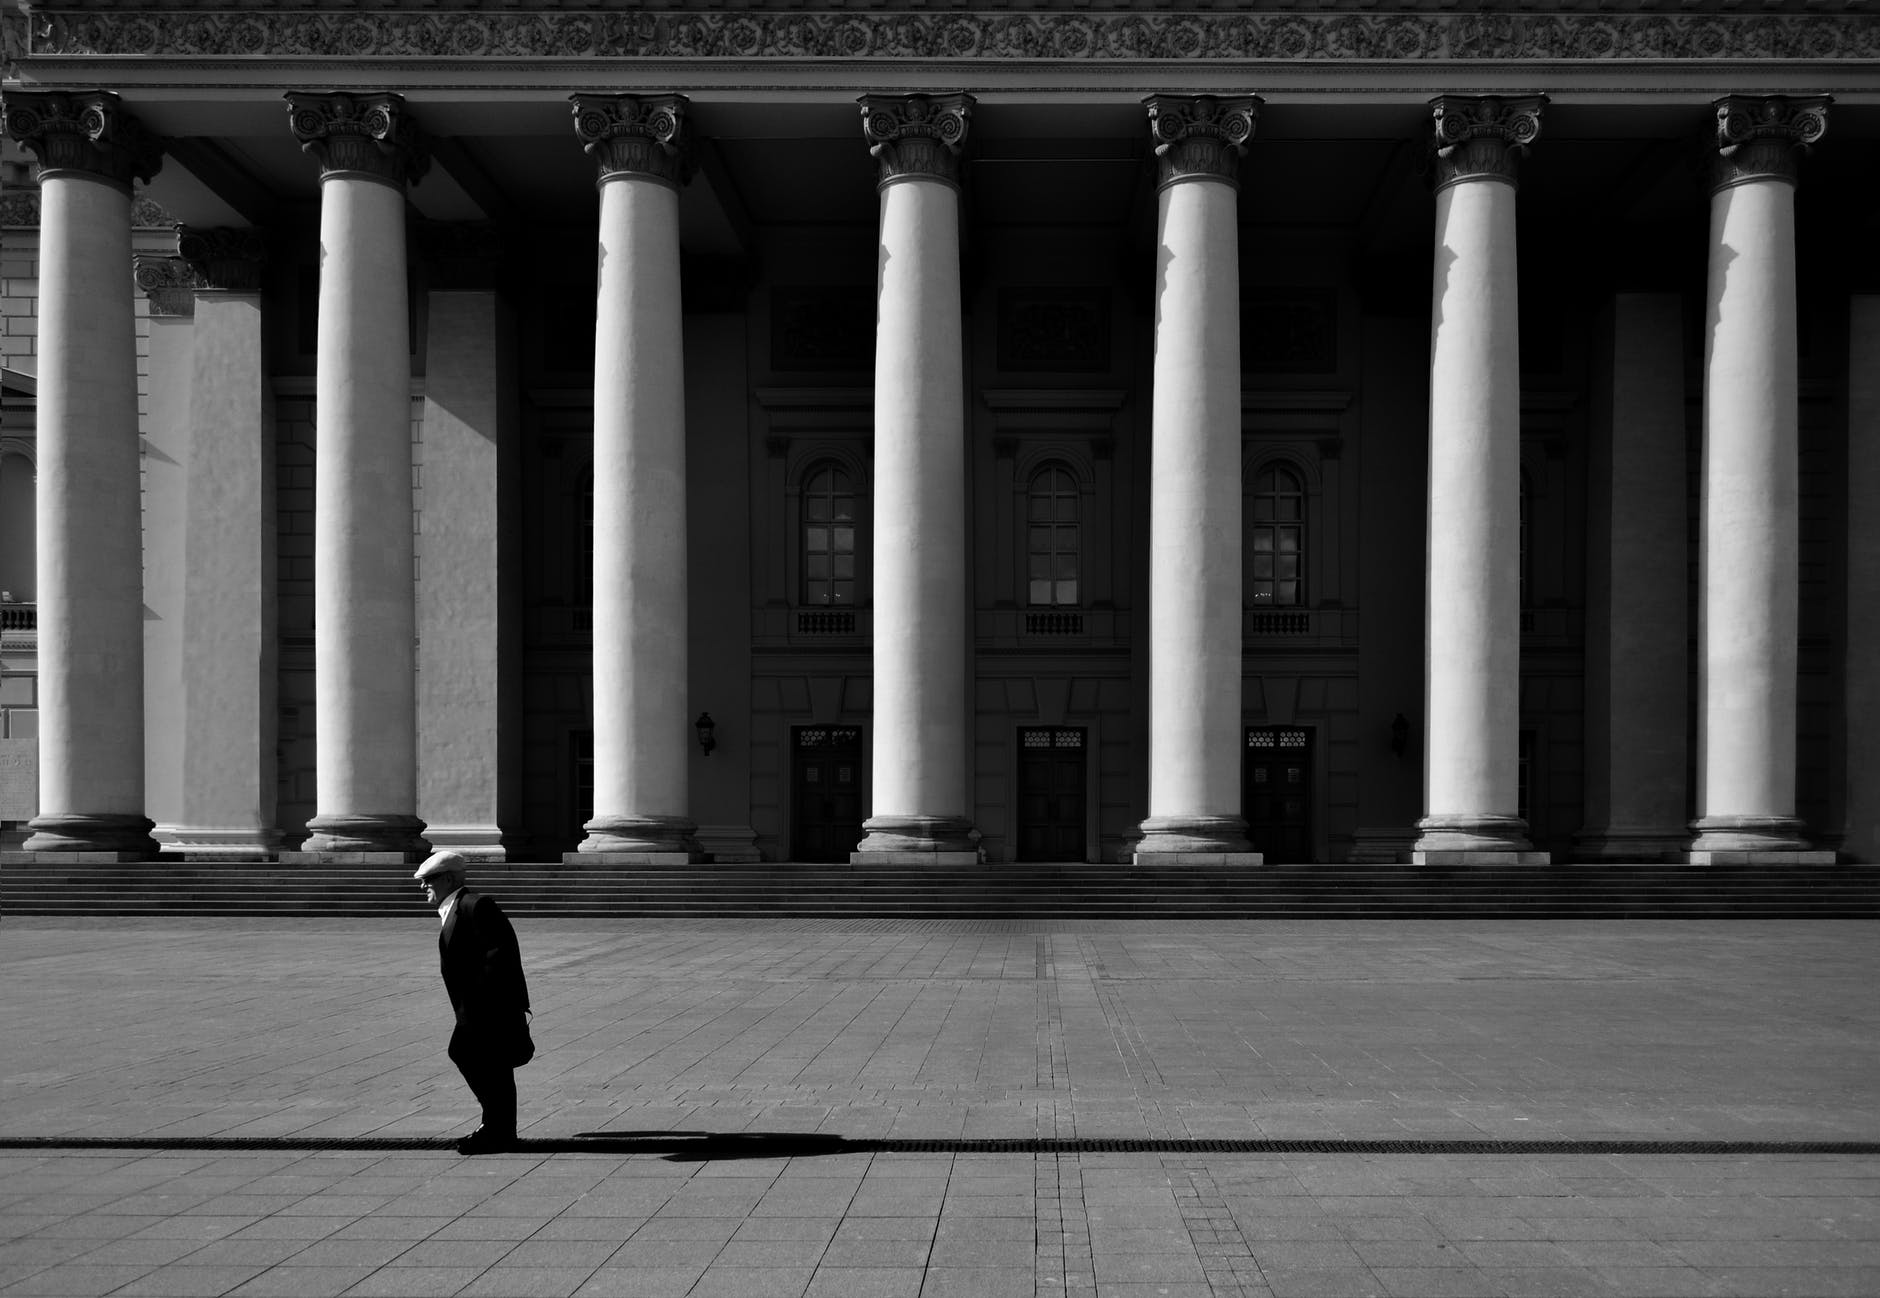 unrecognizable citizen against old urban building with colonnade